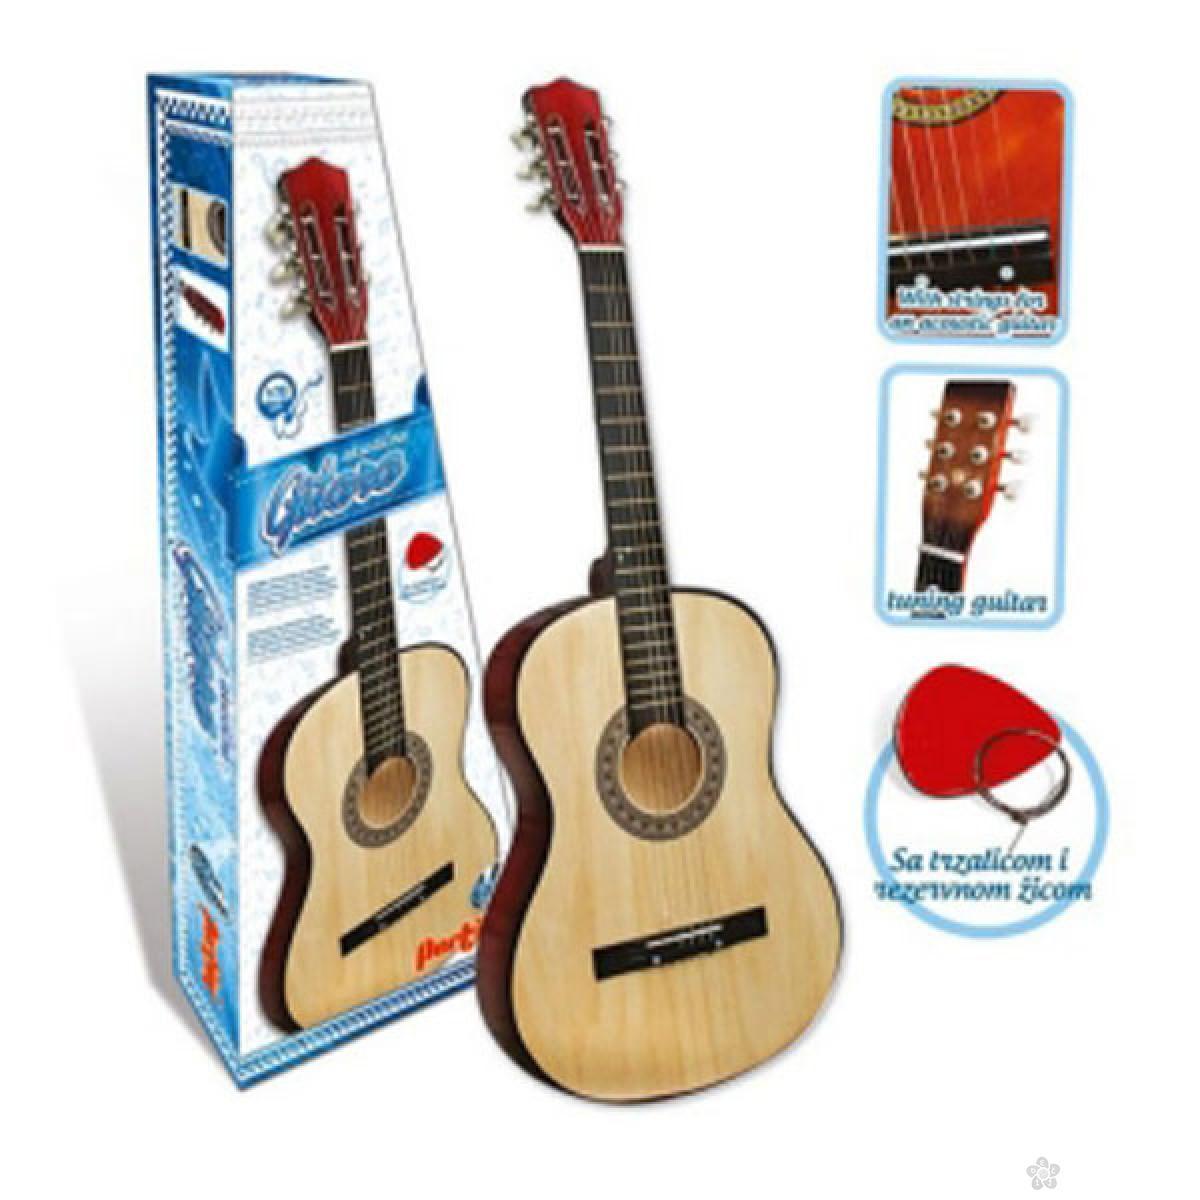 Talent gitara 34472